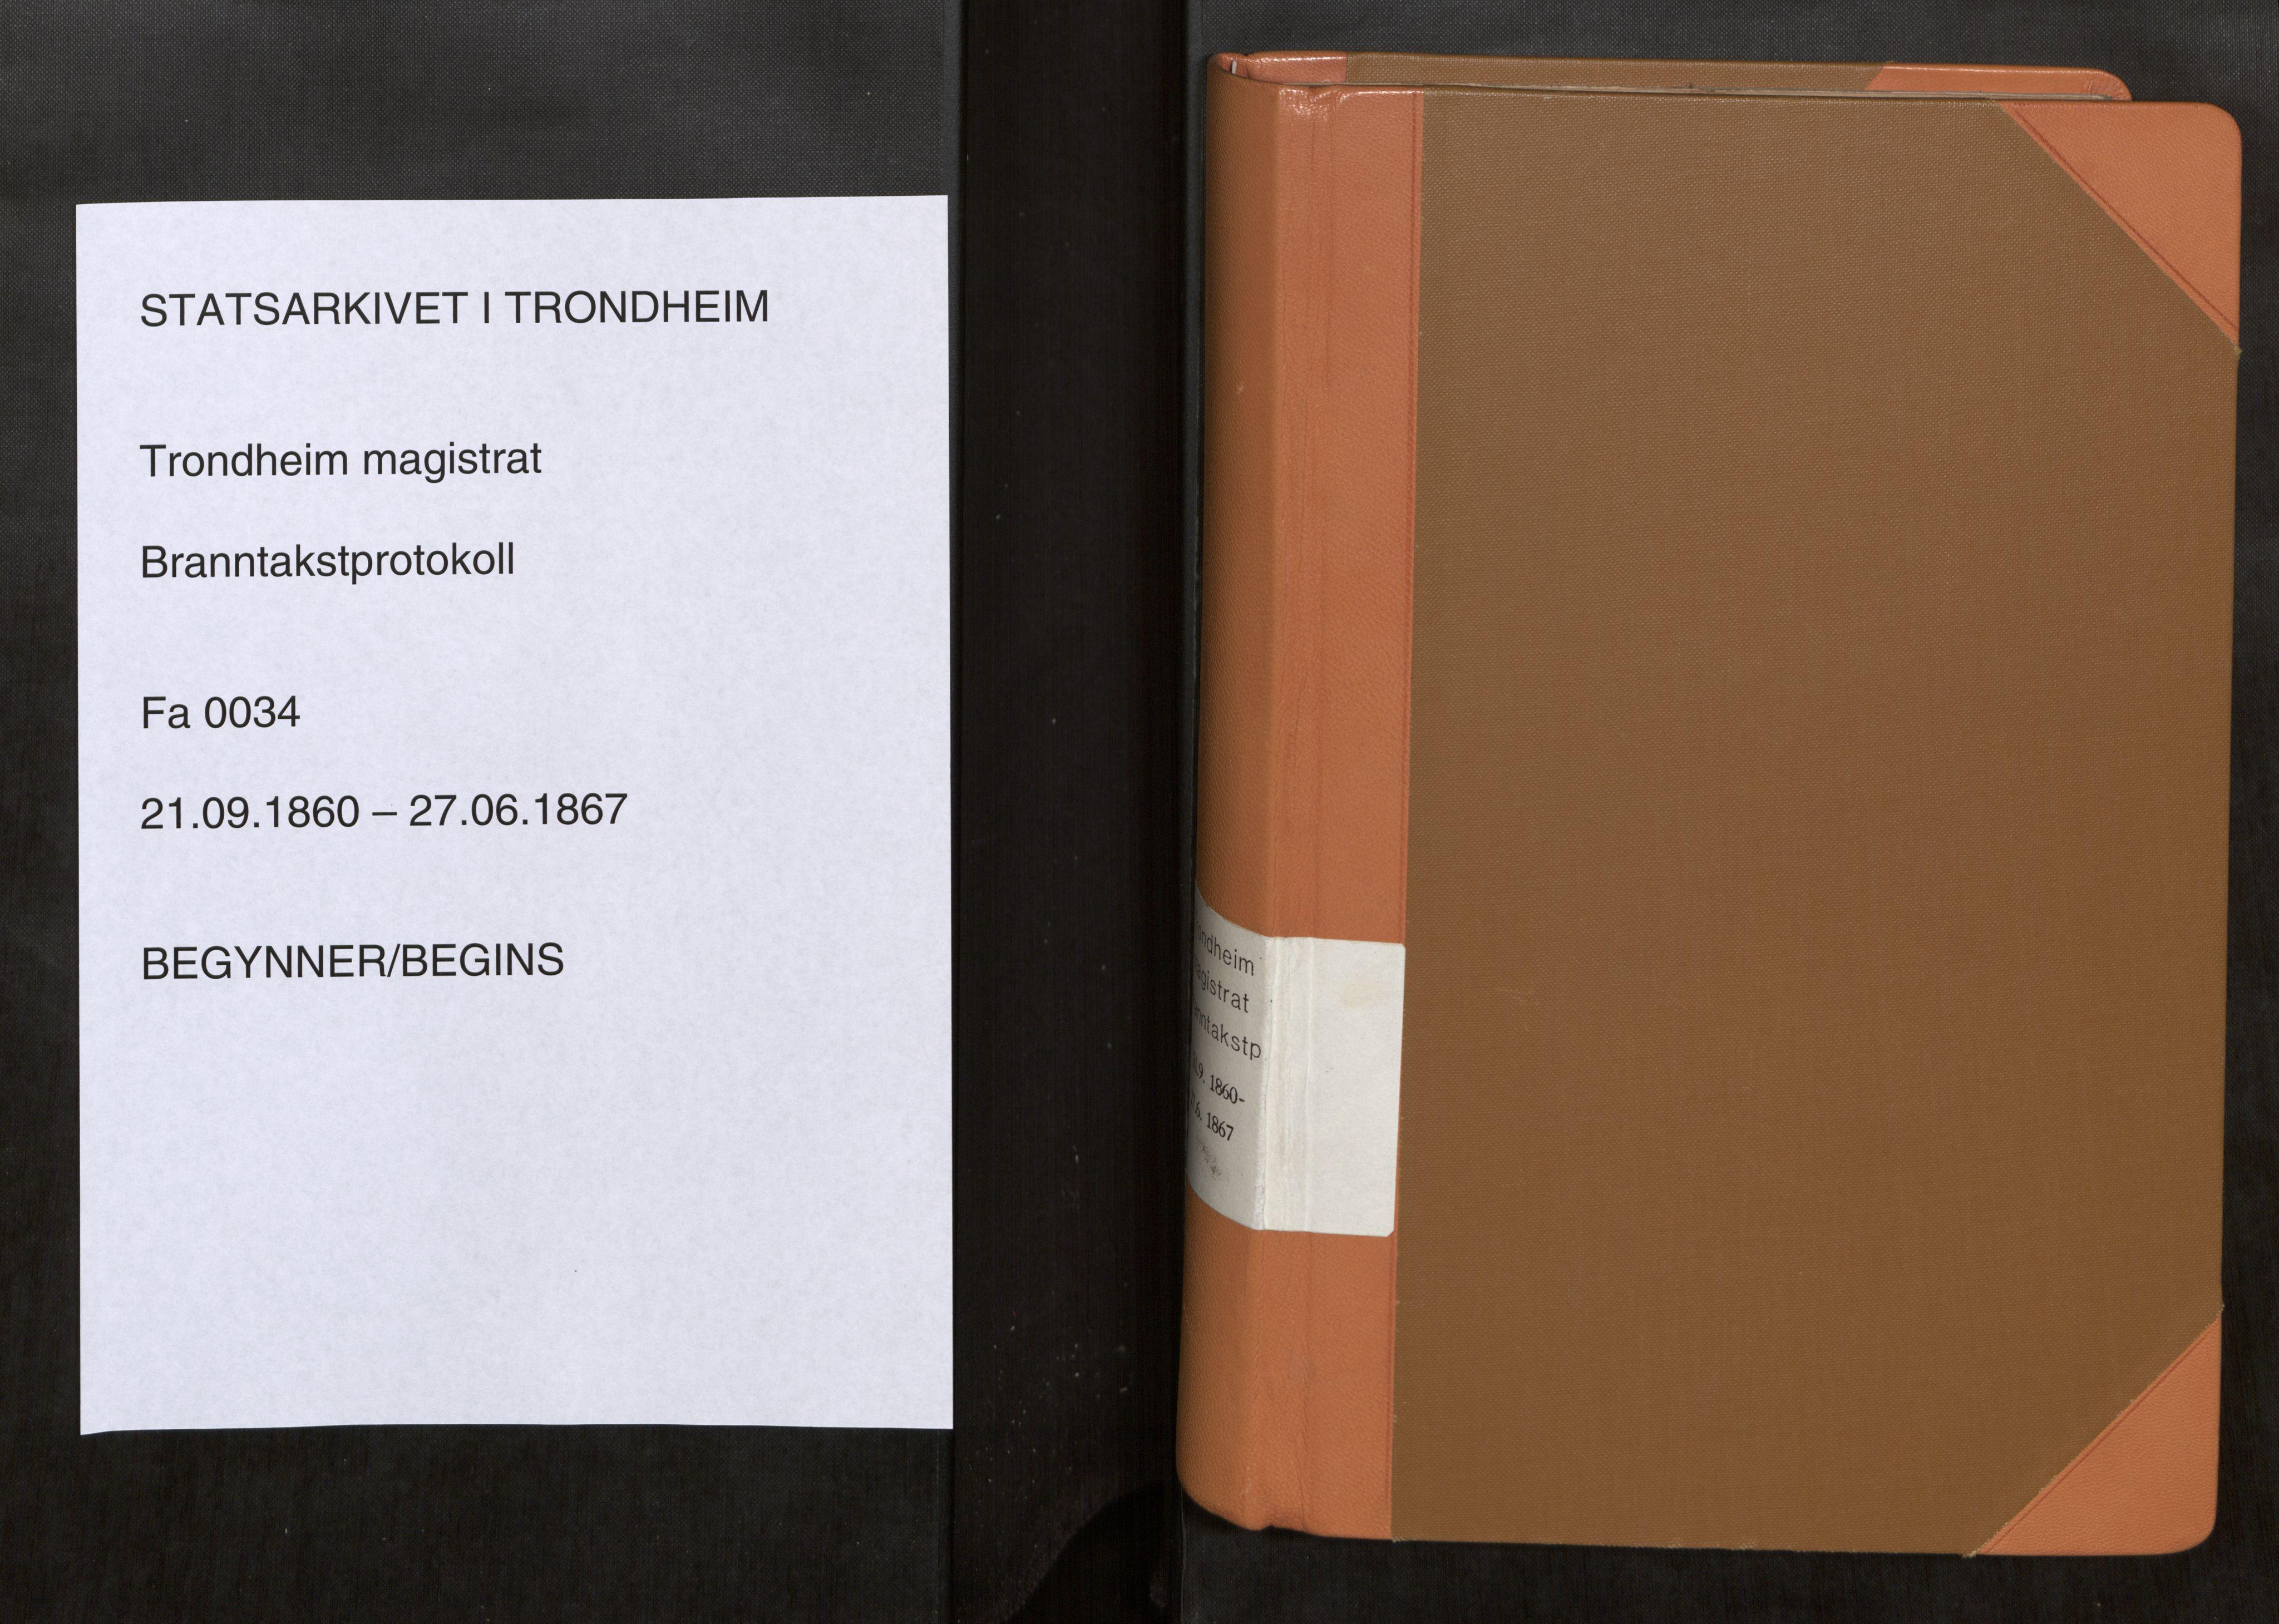 SAT, Norges Brannkasse Trondheim magistrat, Branntakstprotokoller med tekst, nr. 34: 1860-1867, 1860-1867